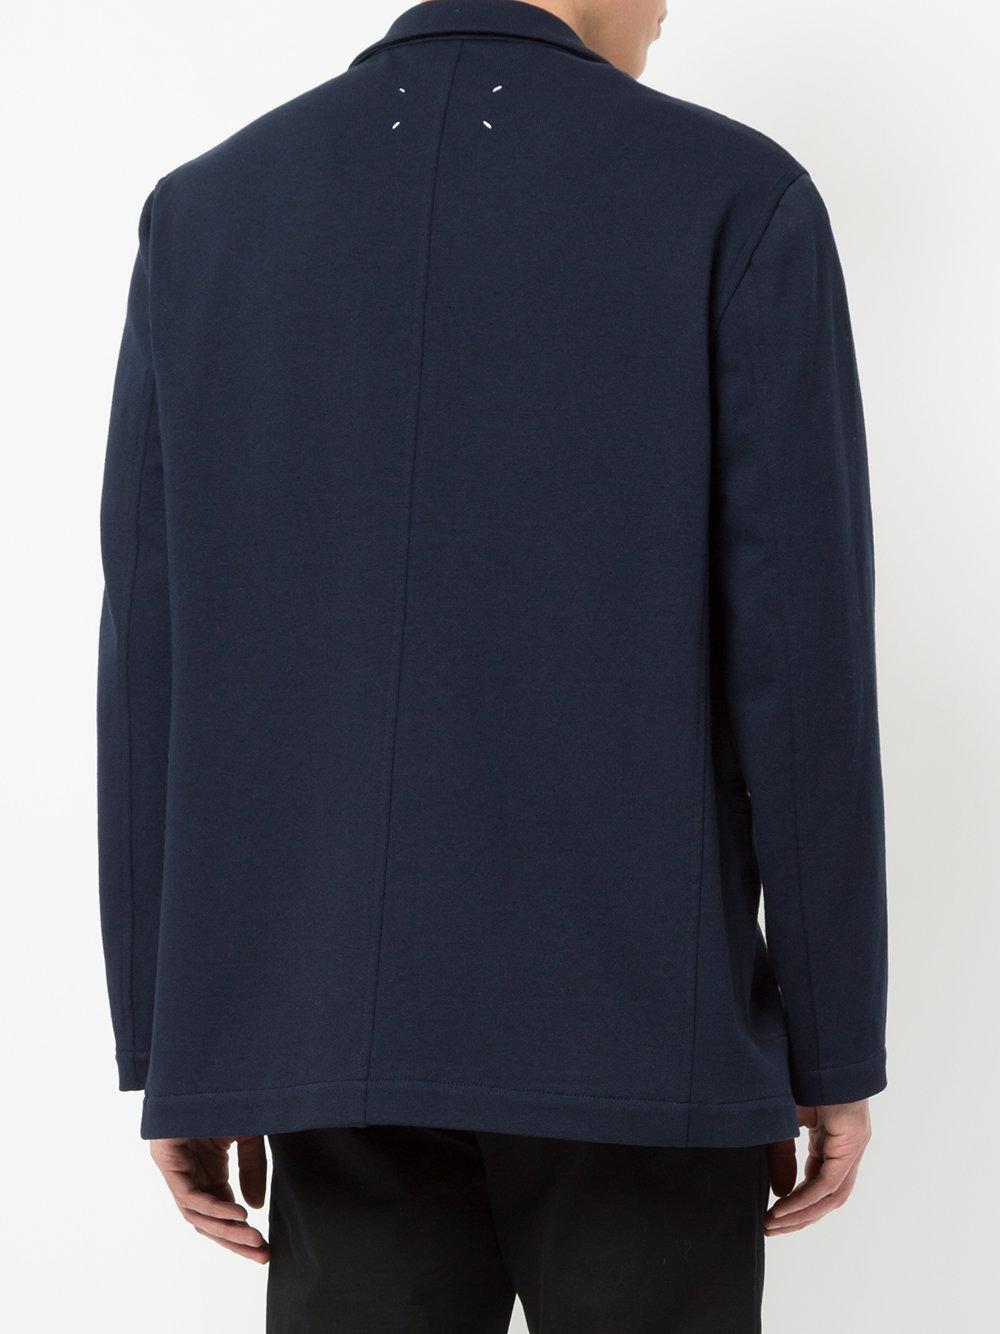 Maison Margiela Cotton Relaxed Blazer Jacket in Blue for Men